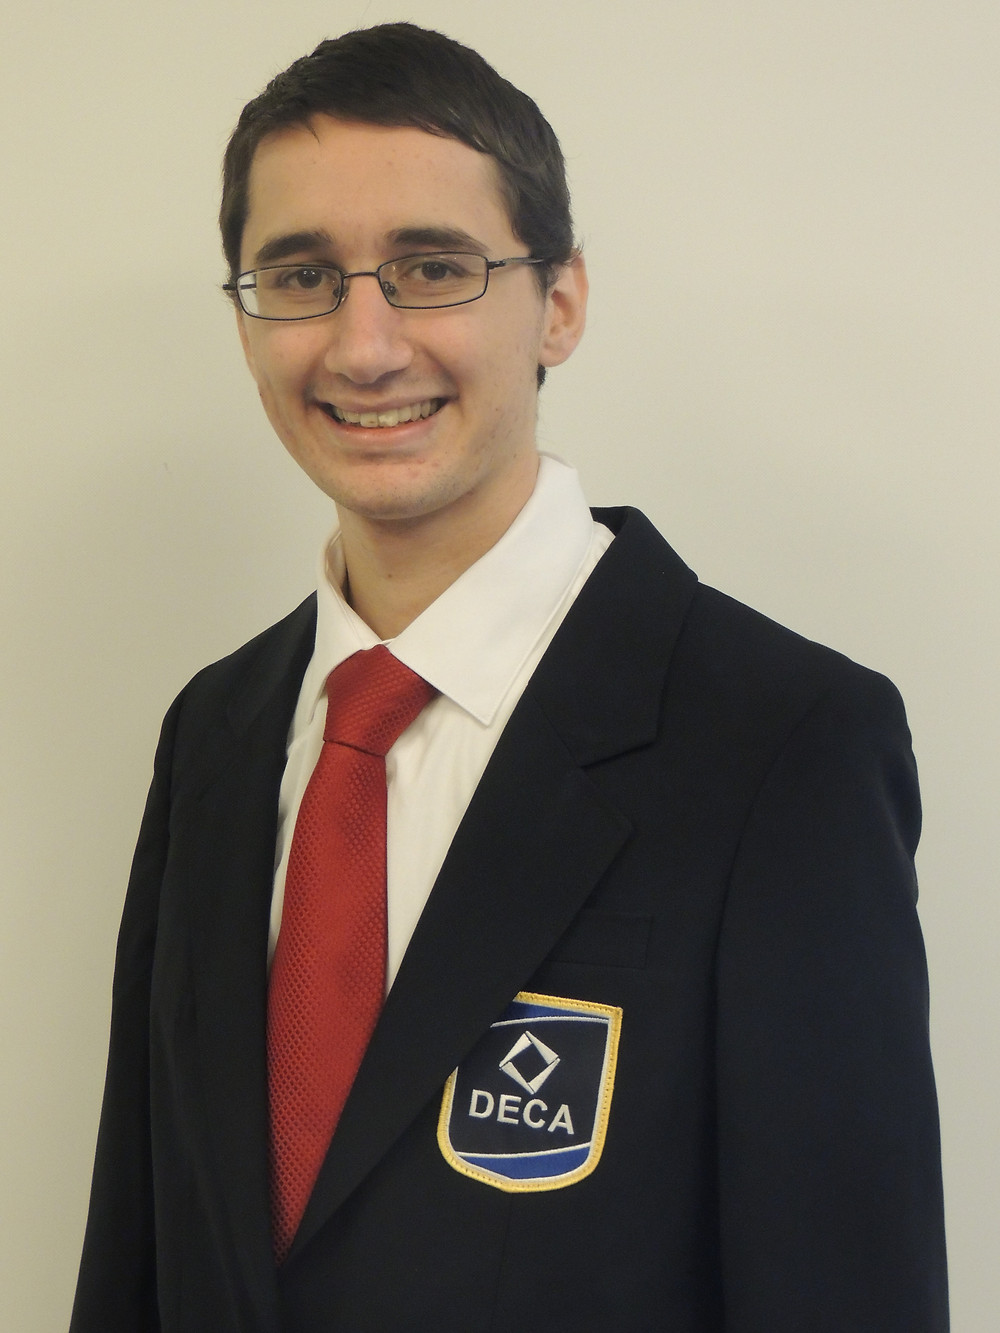 Tyler Guy, Metro Region Vice President